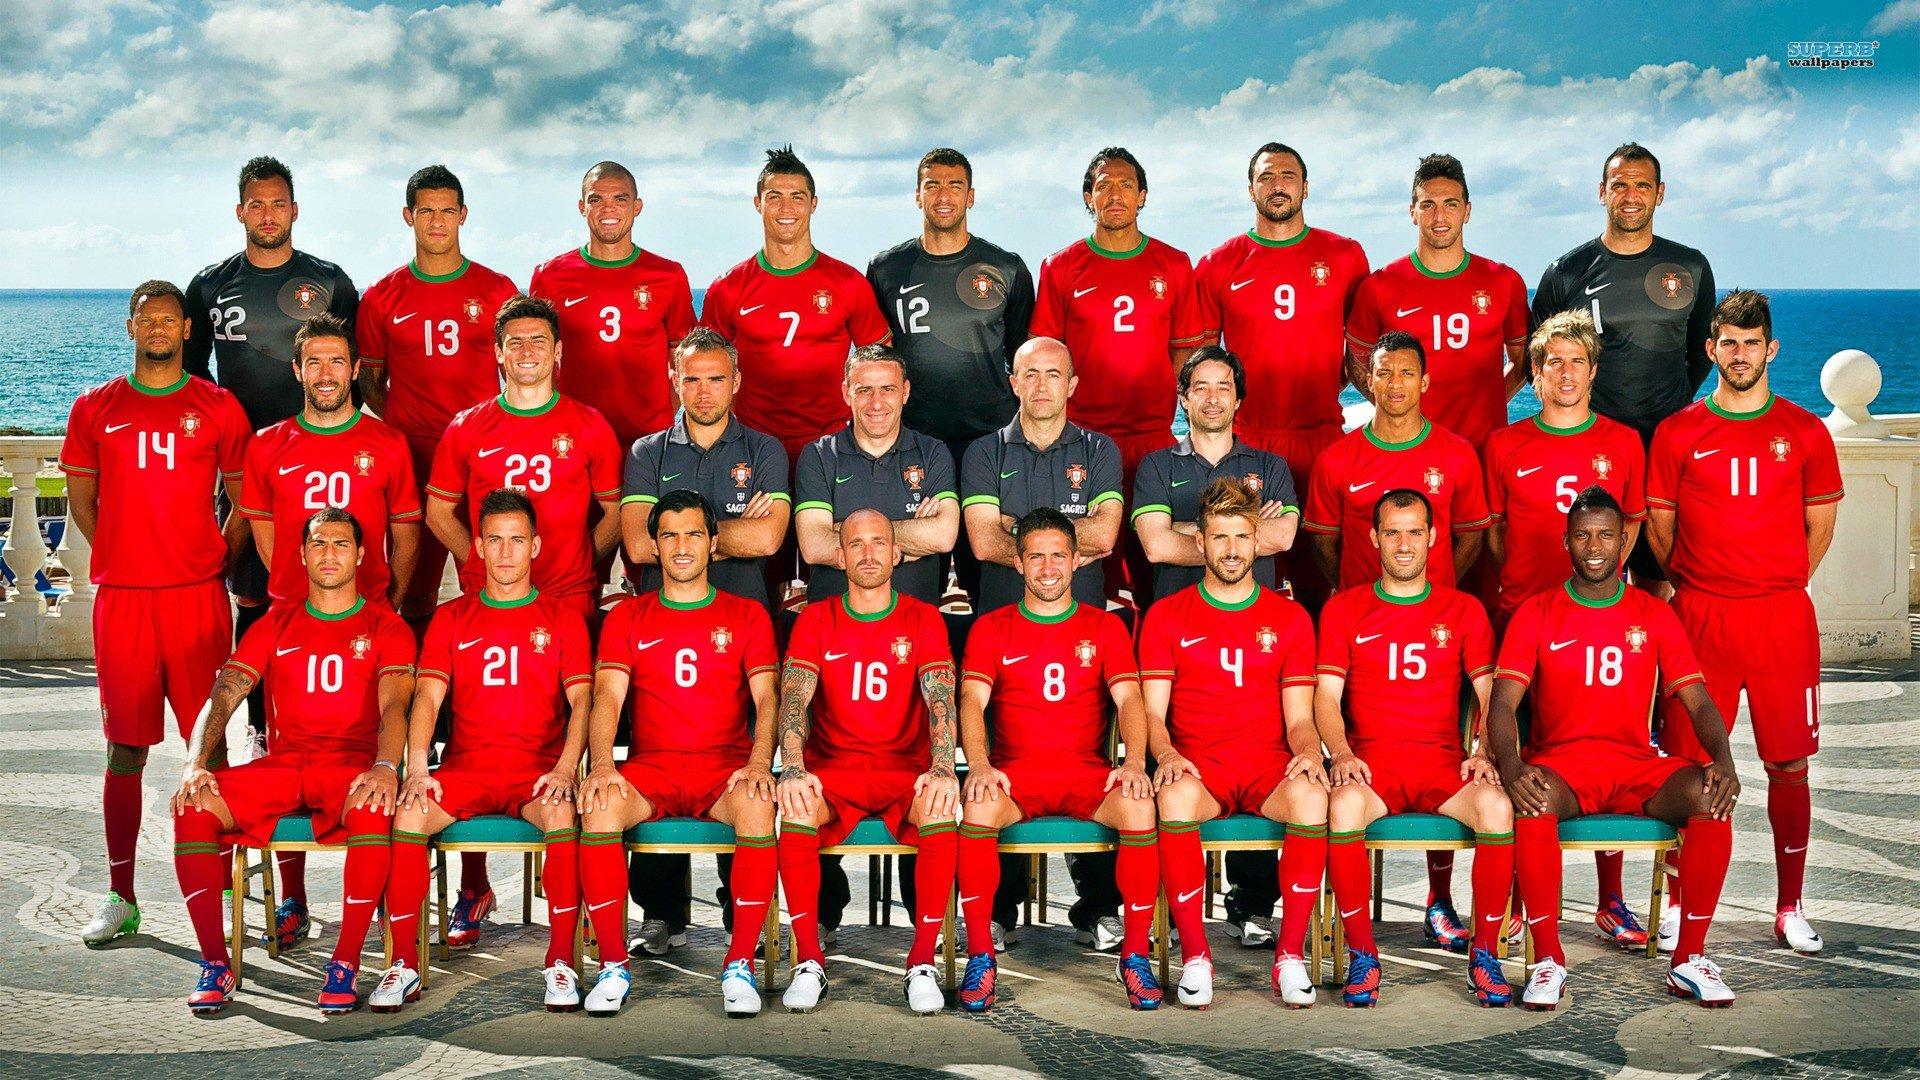 portugal national football team - photo #8